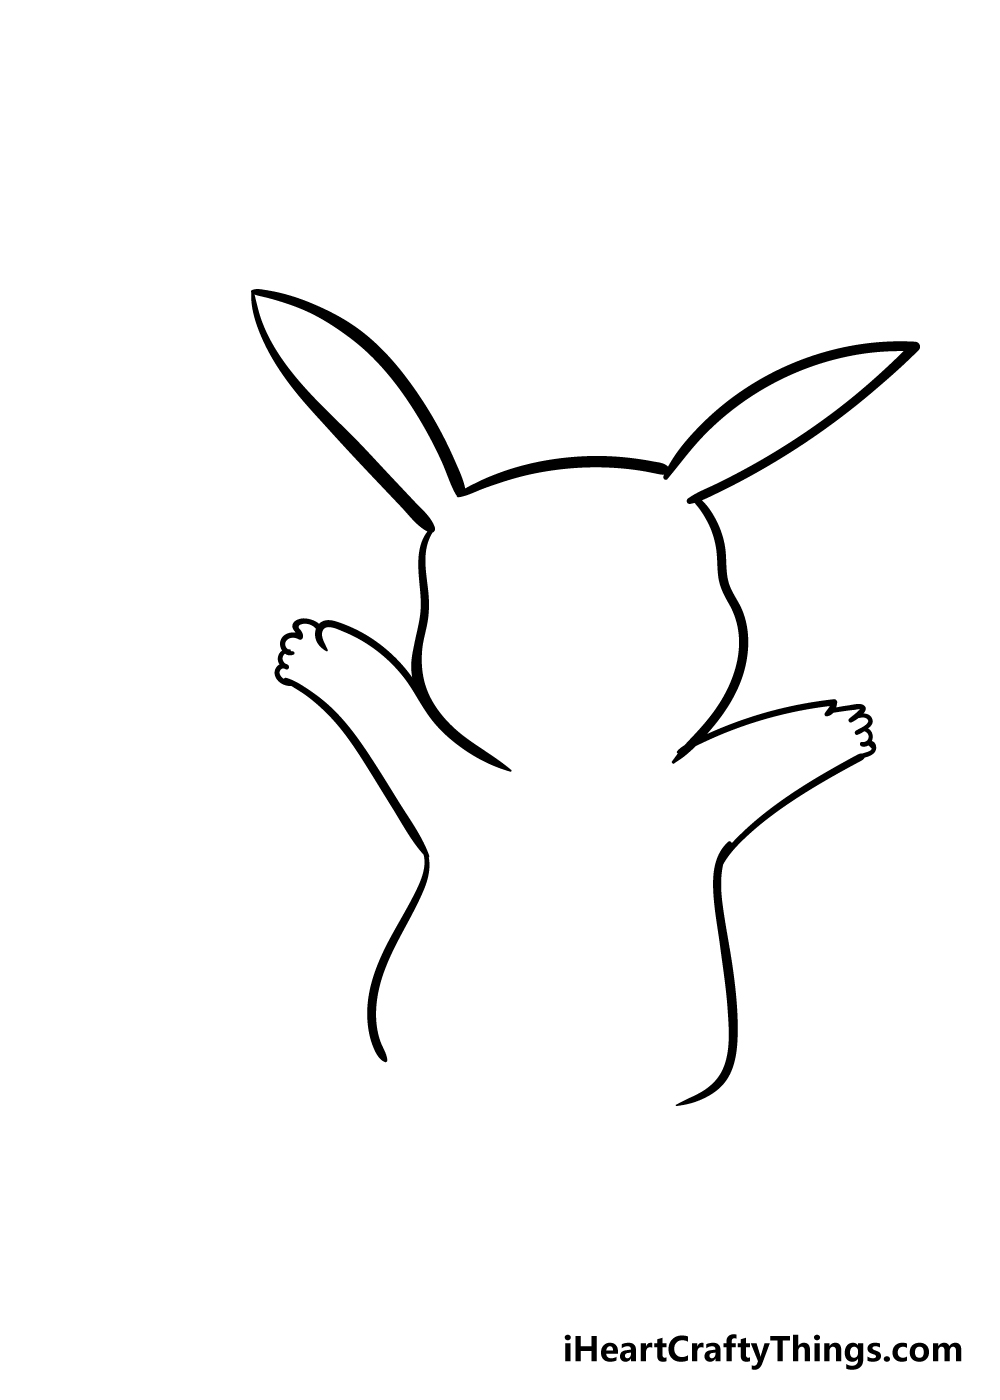 pikachu drawing step 3